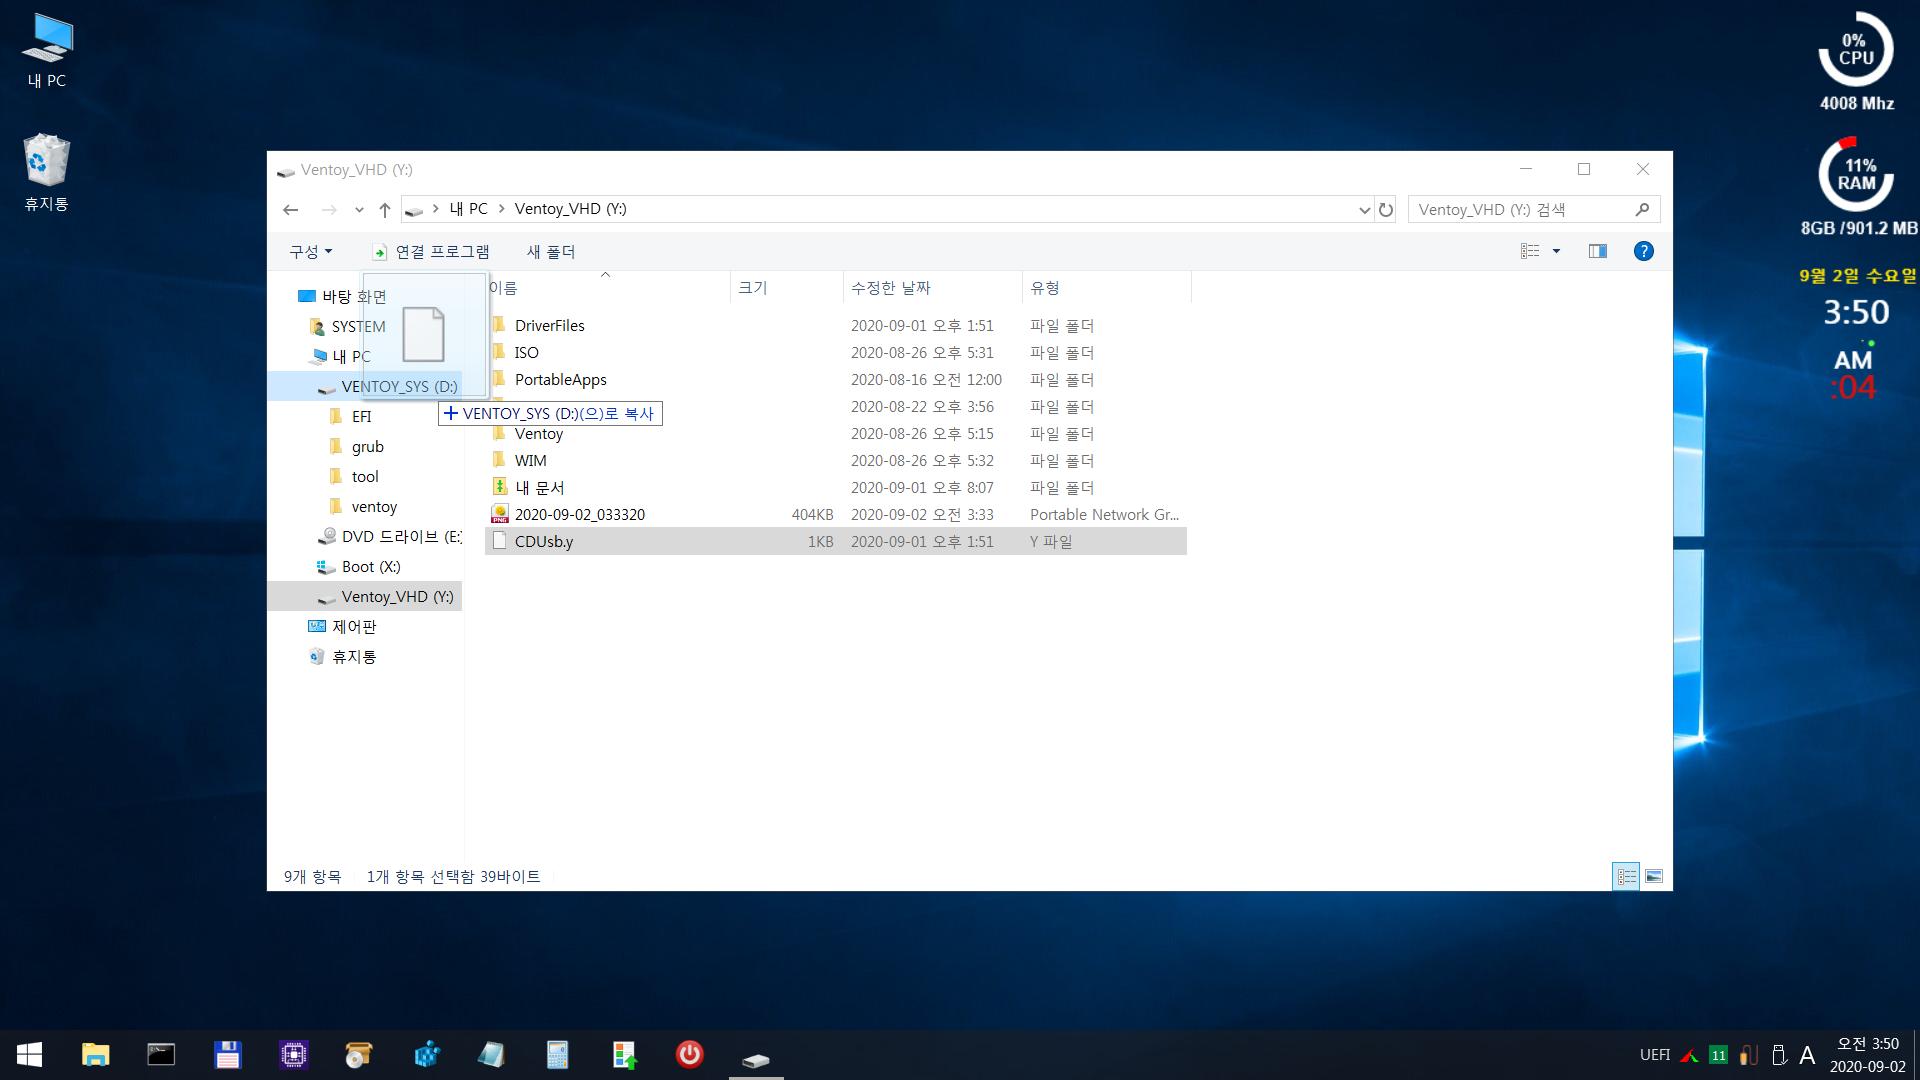 prince pe에 레지스트리 하이브 파일 추가 + 용량 최적화 - Ventoy에 wim 부팅하여 드래그 복사 테스트 - 성공 2020-09-02_035005.png